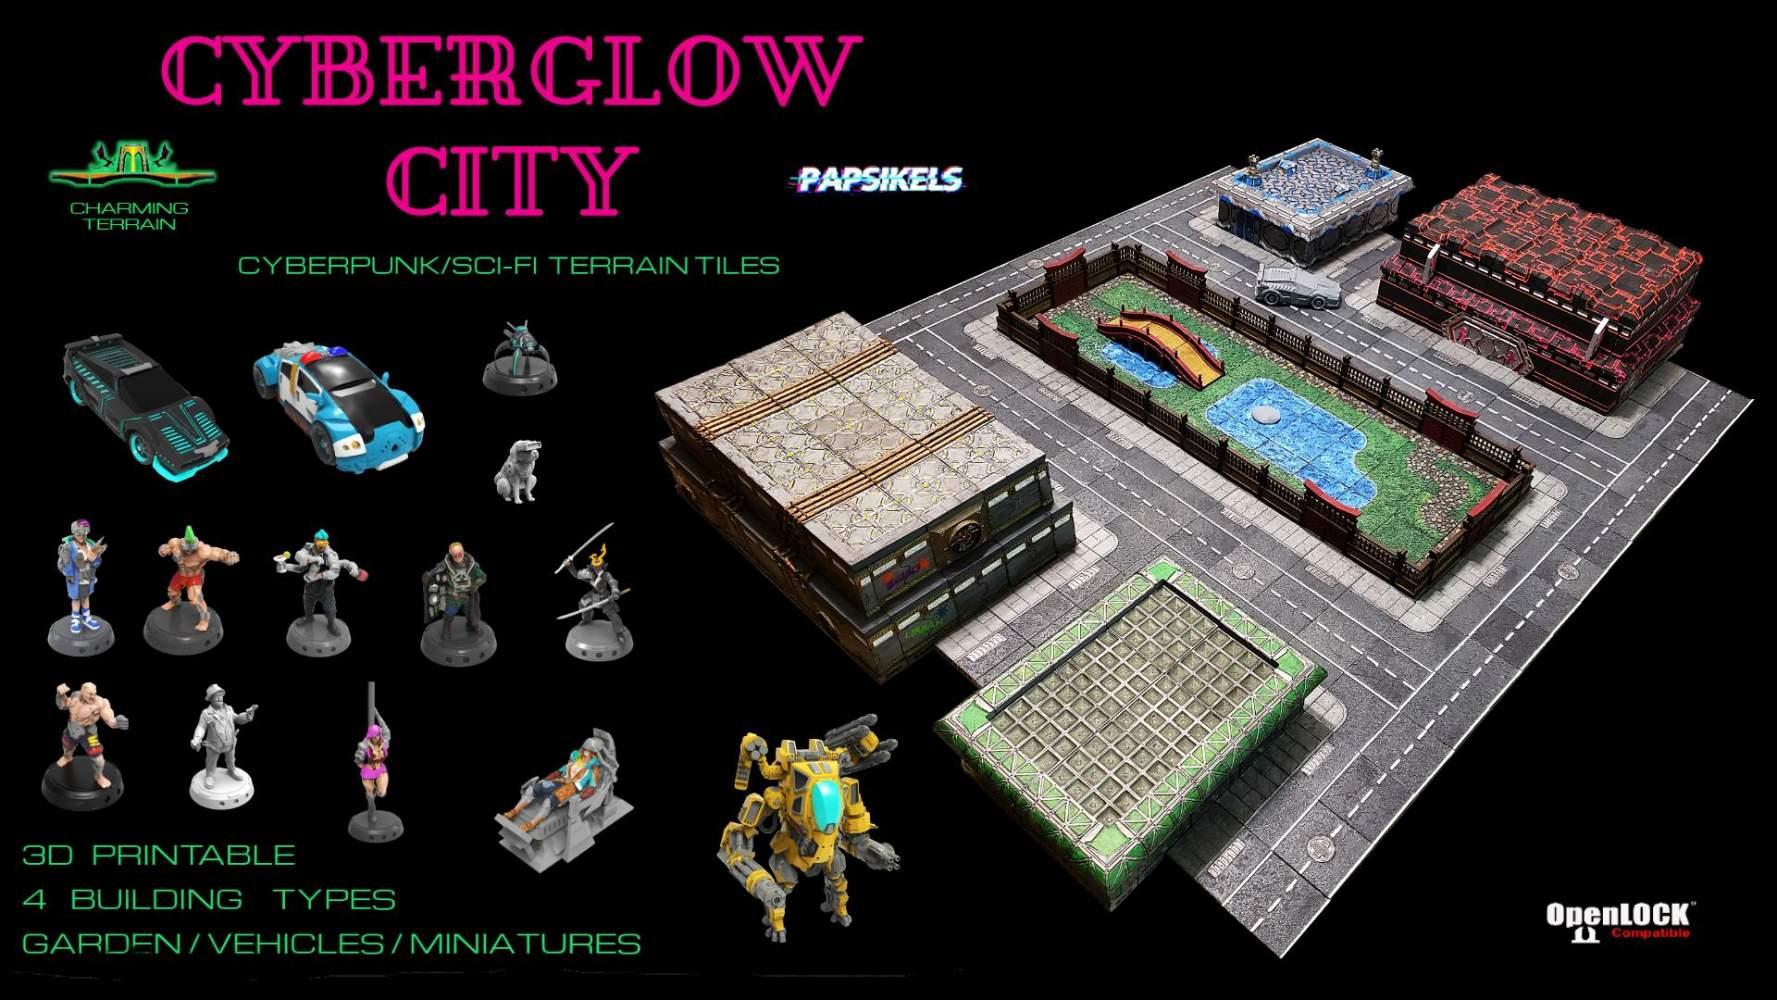 Cyberglow City - Cyberpunk & Sci-fi 3D printable STL Terrain & Miniatures